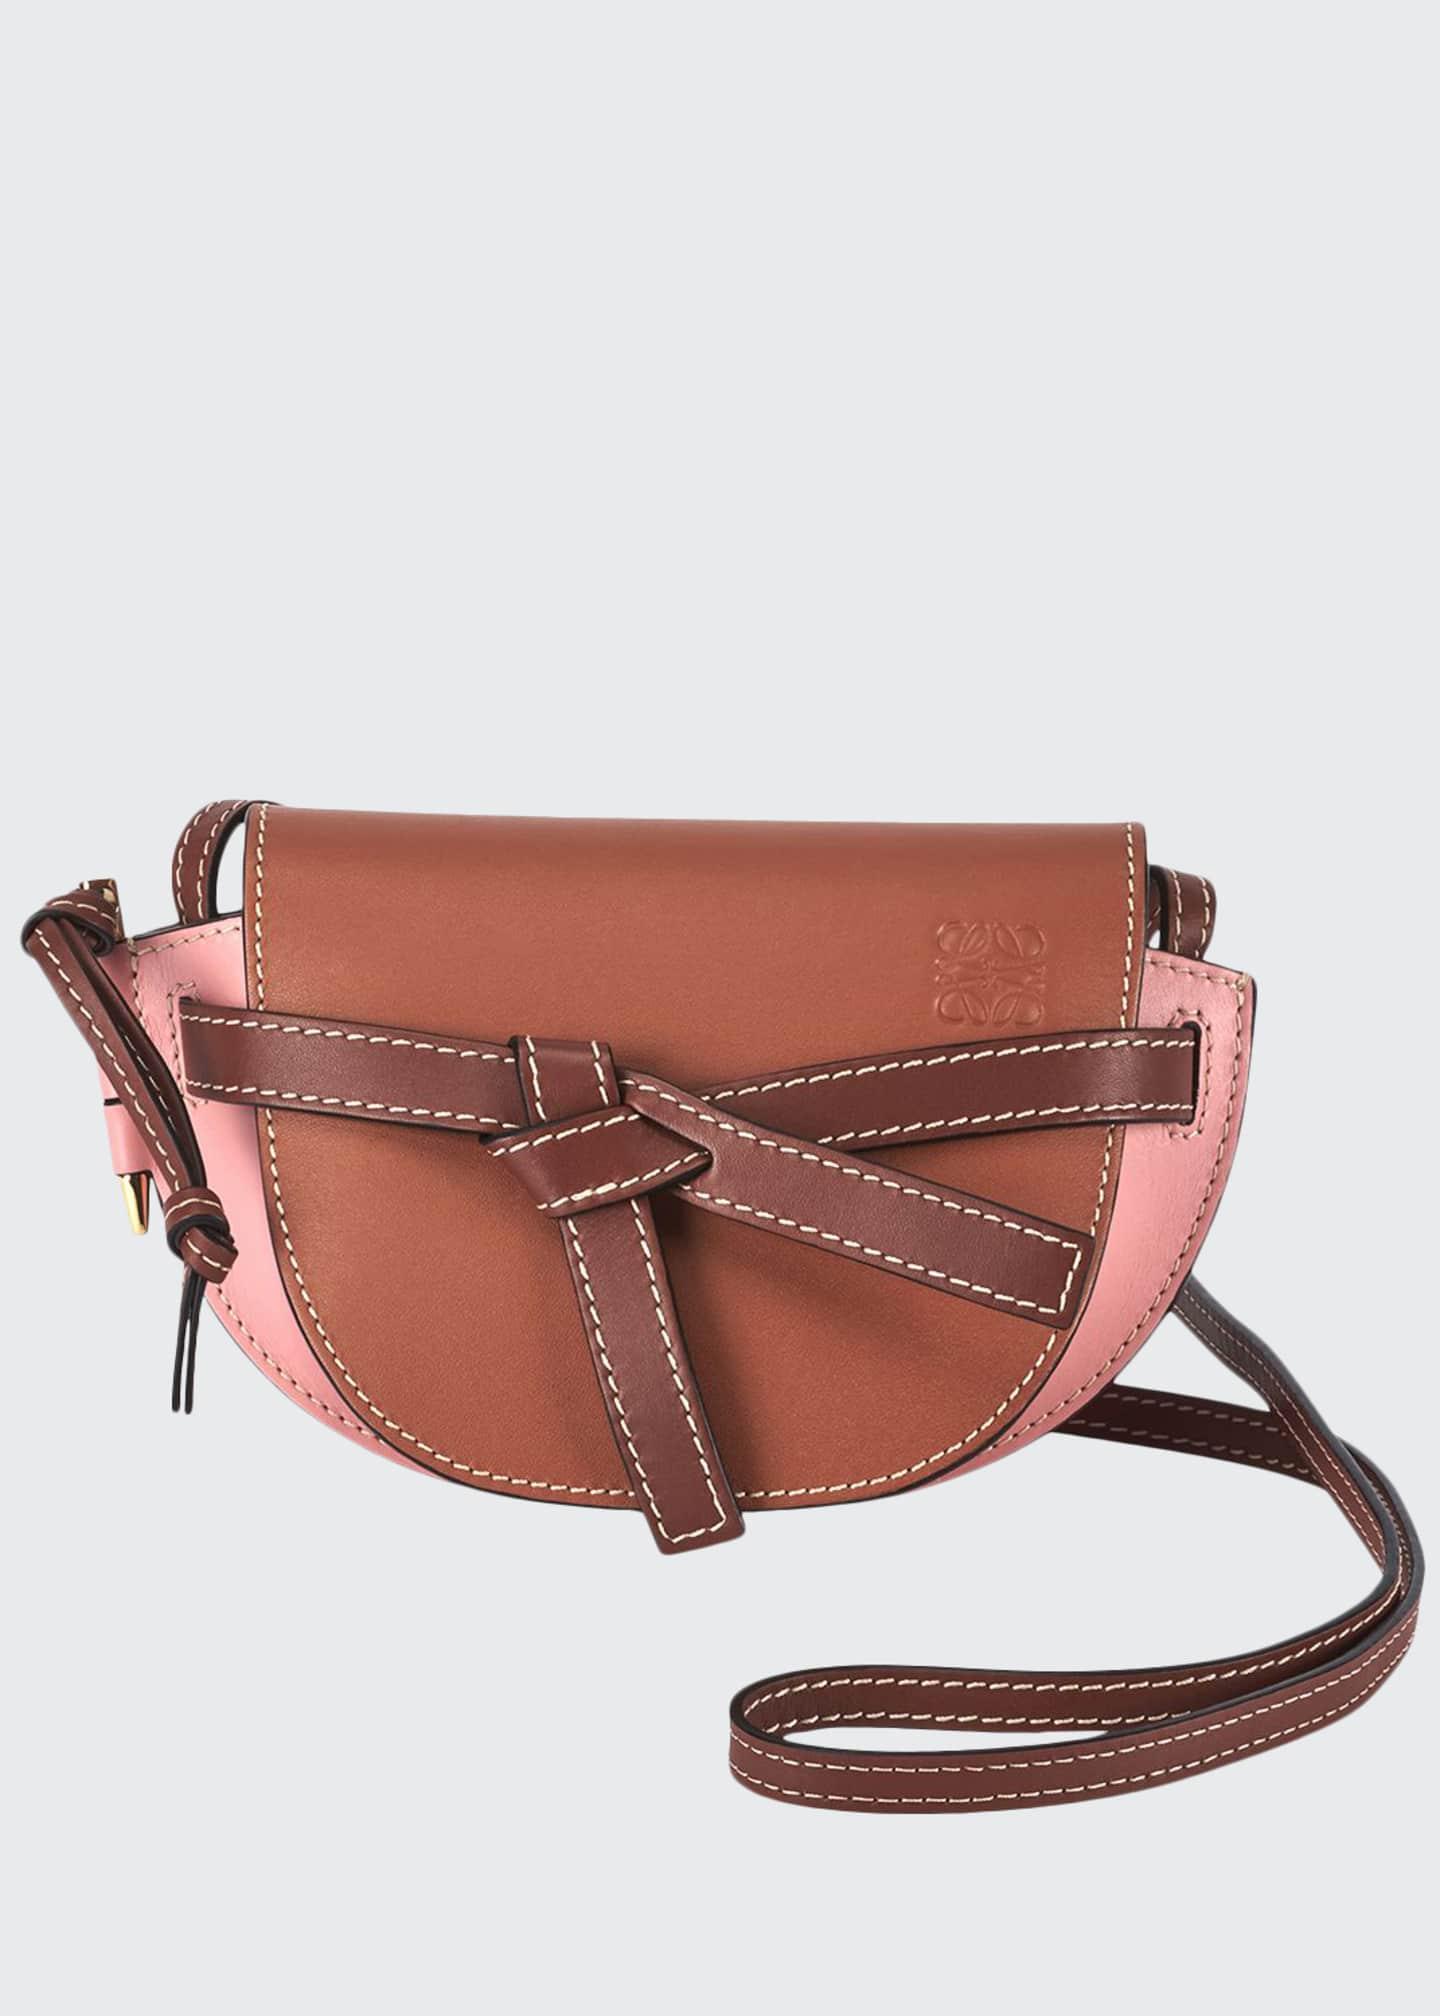 Loewe Gate Two-Tone Leather Shoulder Bag